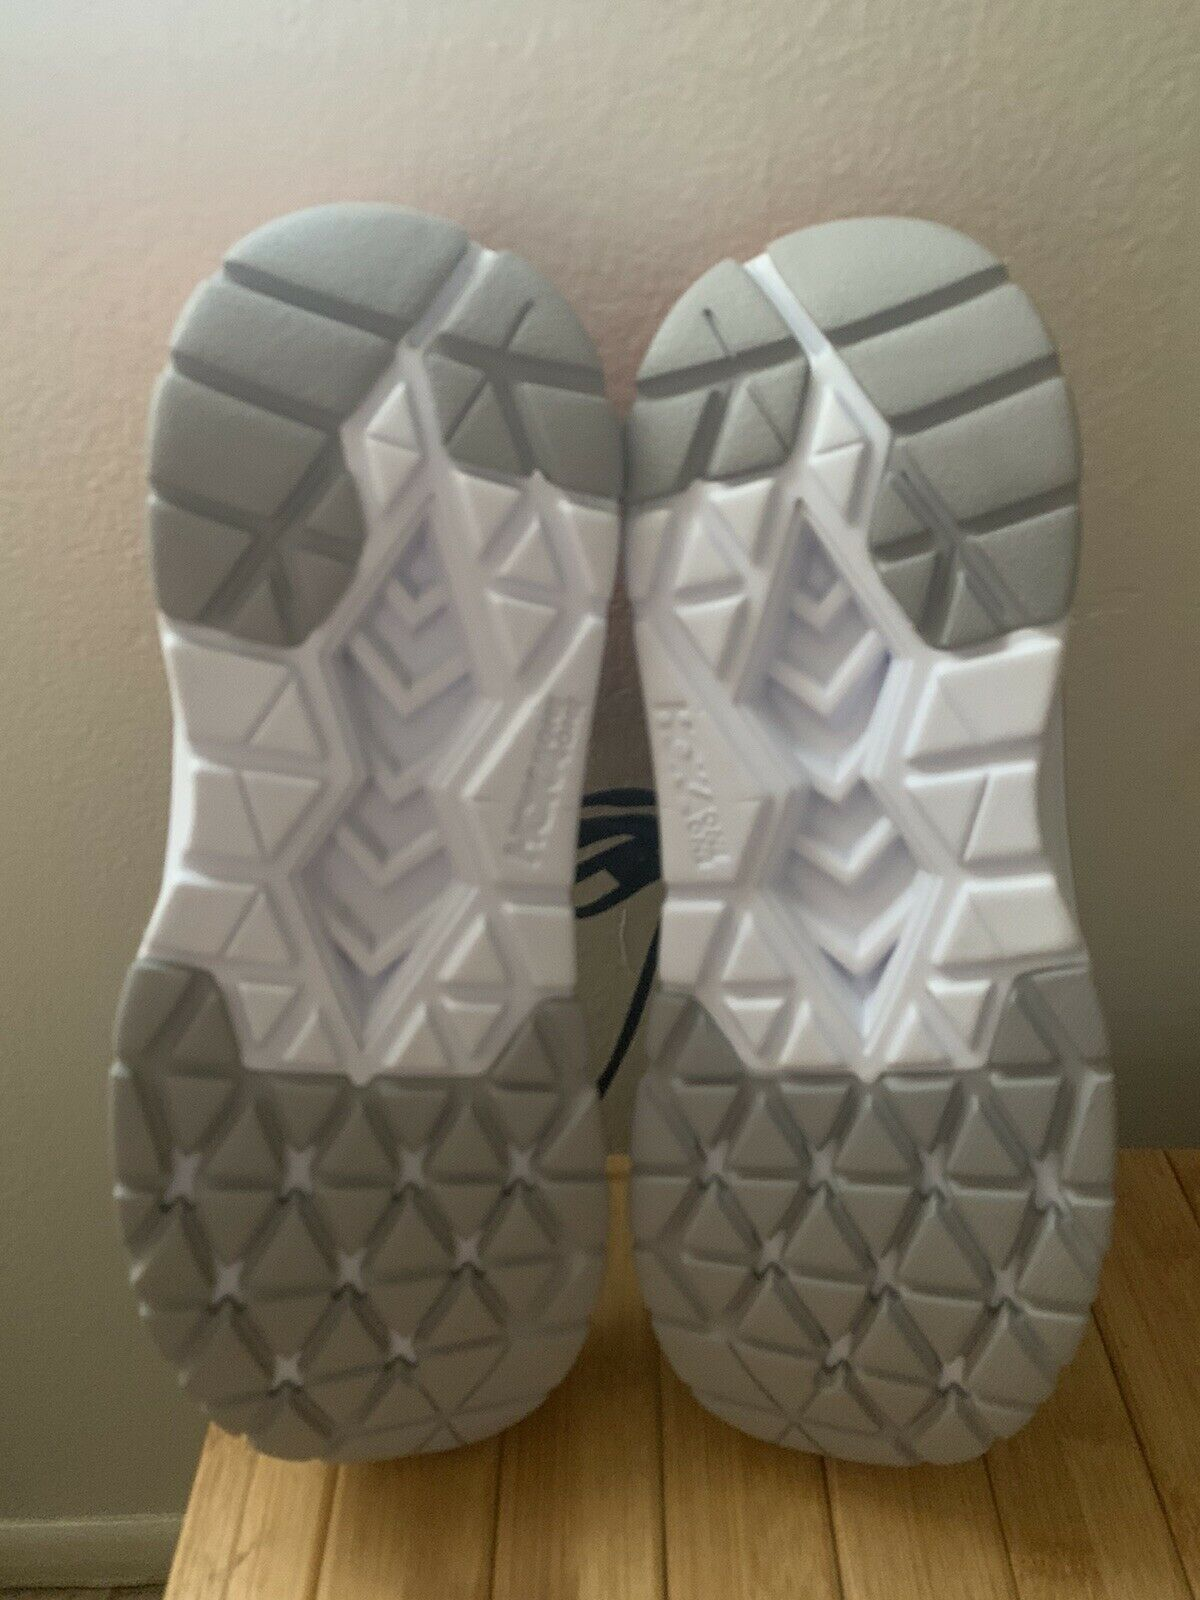 Men's Hoka One One Cavu 2 Running Shoes size 9.5 - image 2